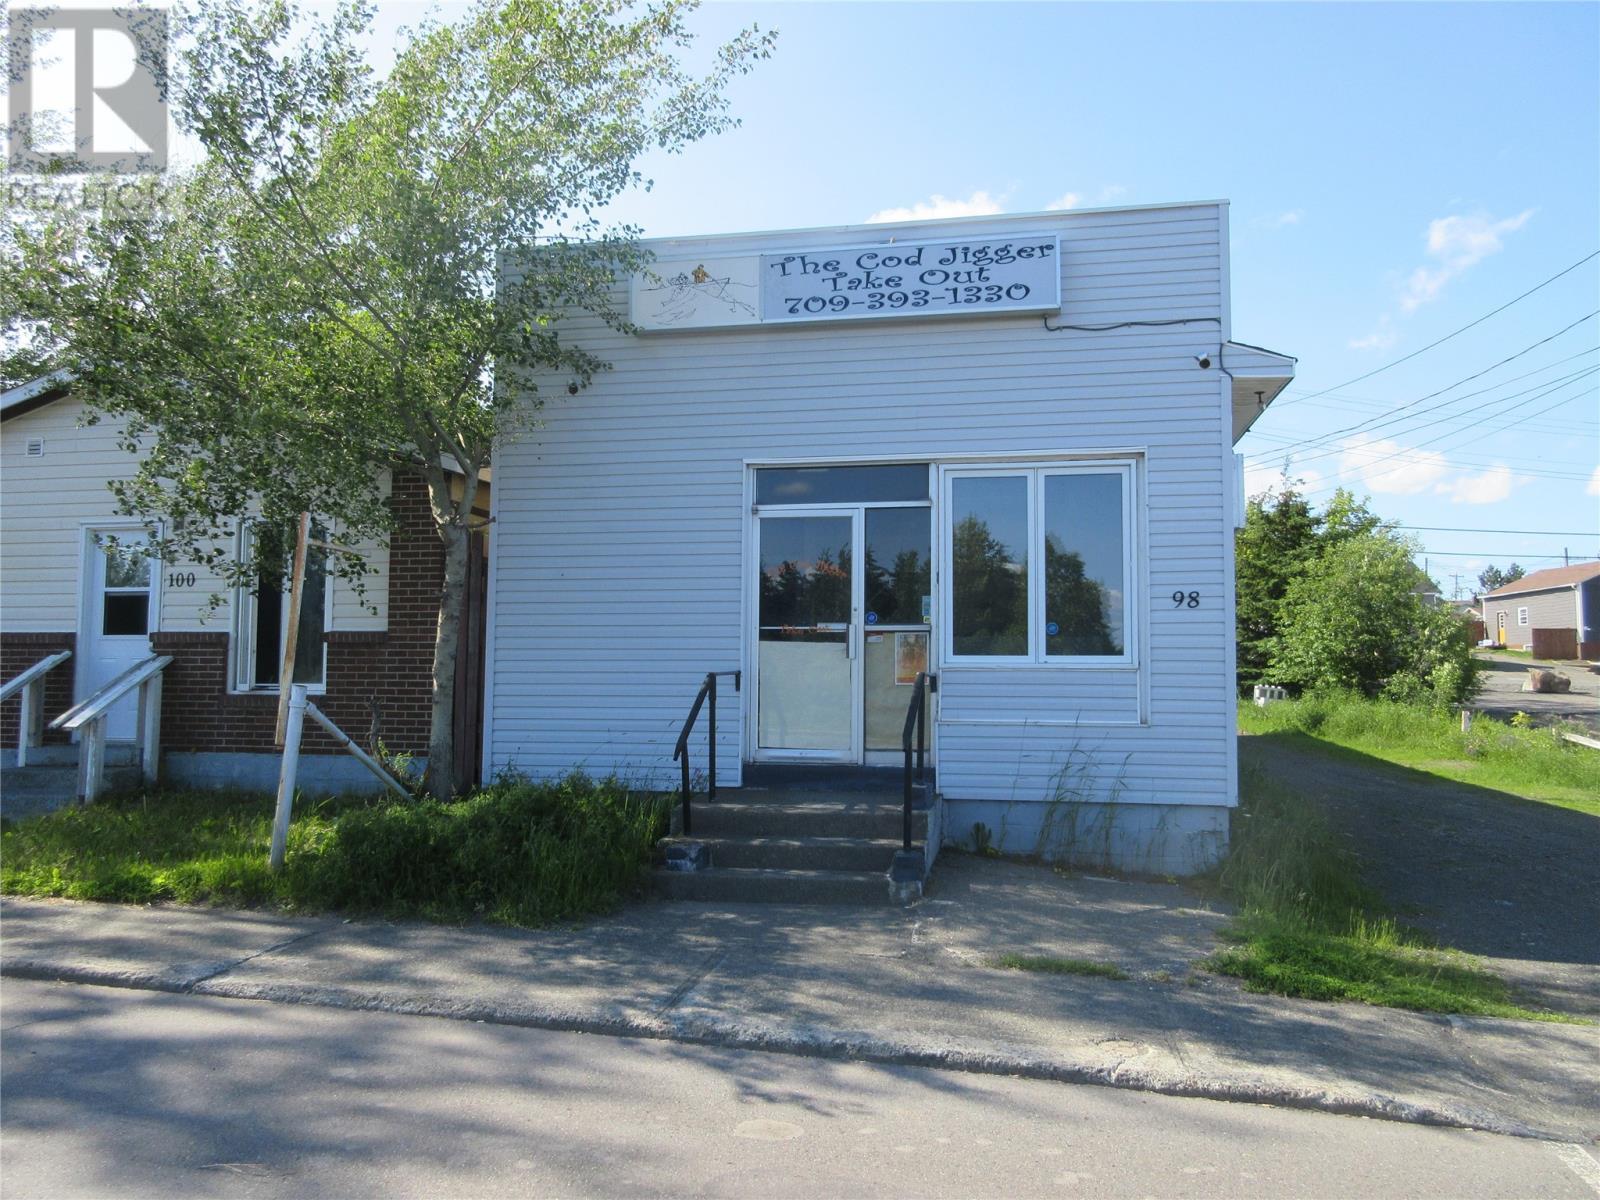 98 Main Street, Grand Falls - Windsor 1211595